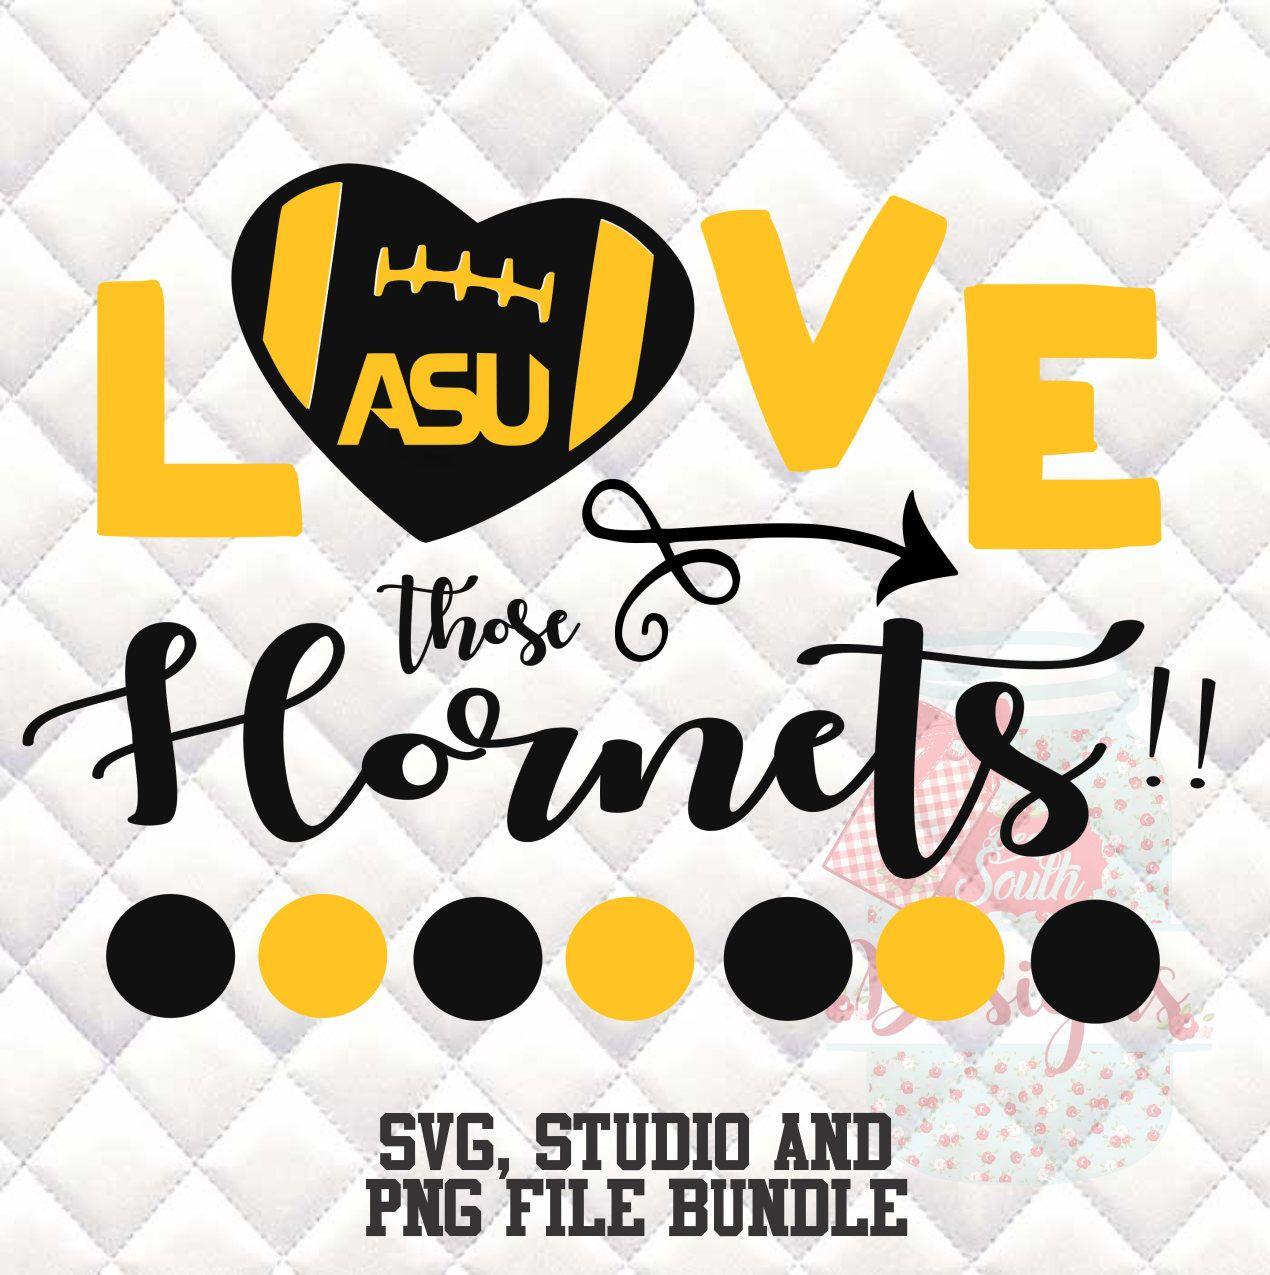 Alabama State University Love Those Hornets Tailgating